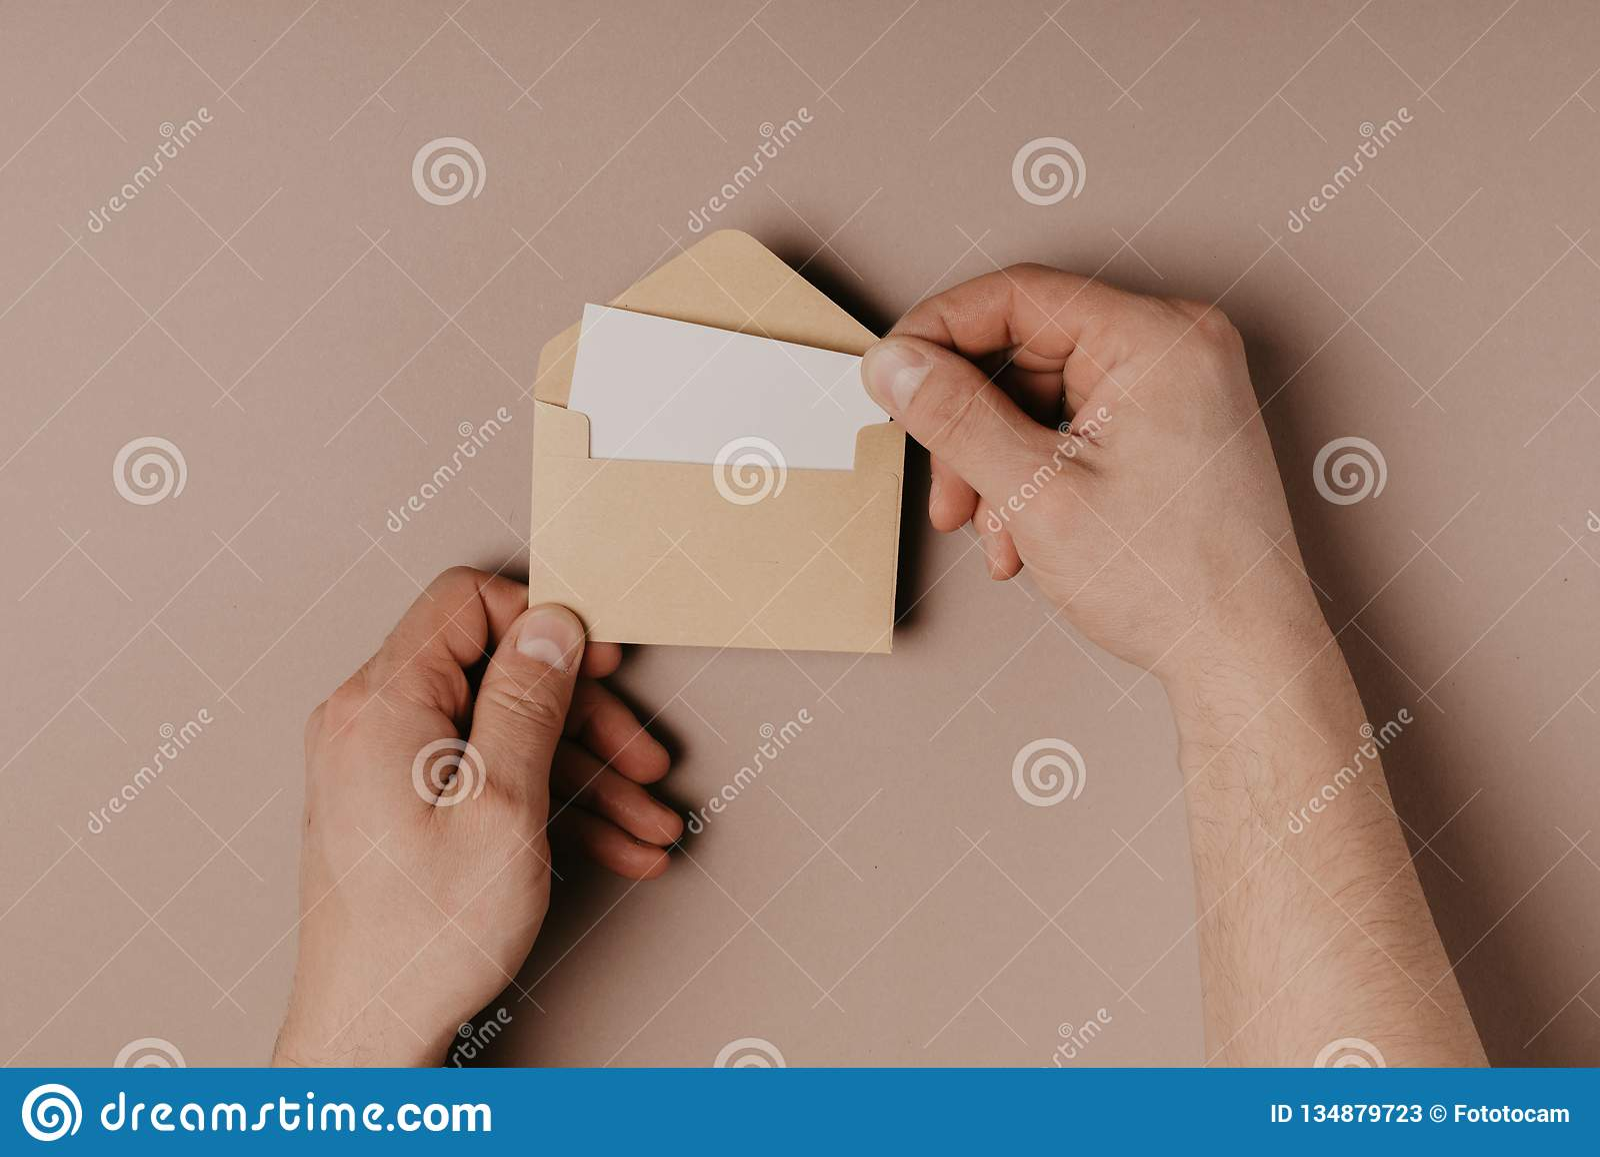 Hand holding blank envelope and letter mockup